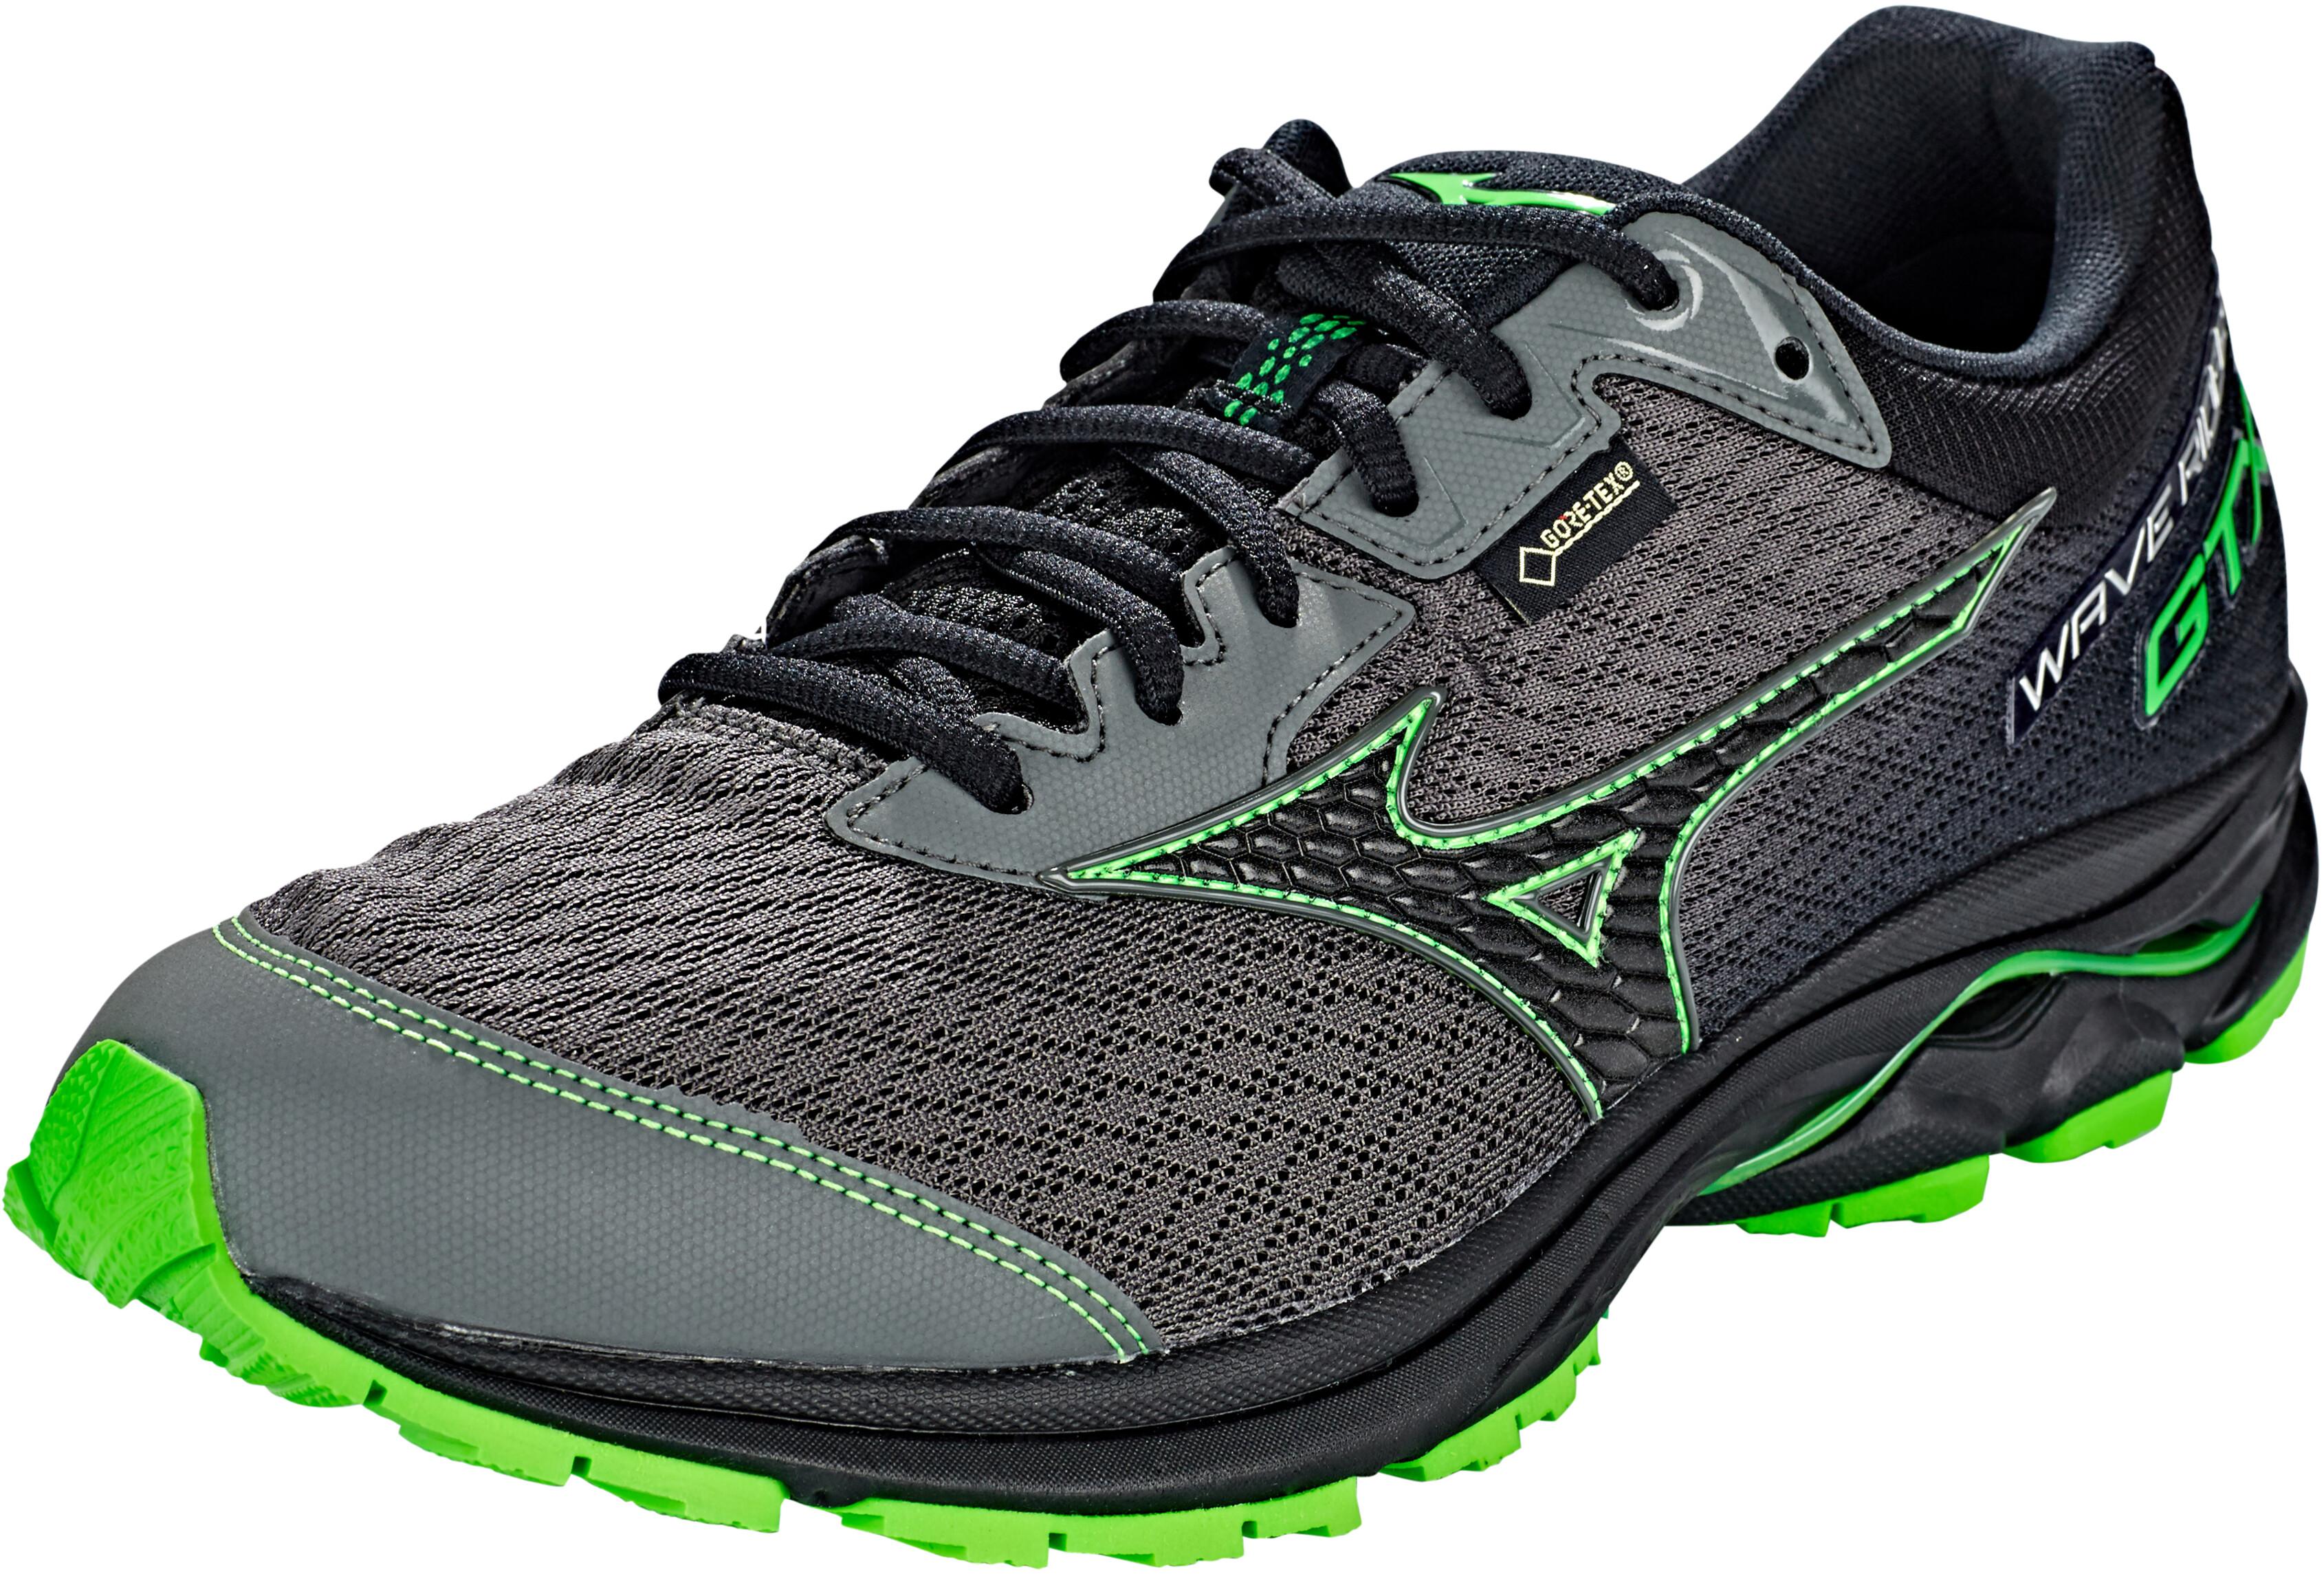 c15a73dd3b2 Mizuno Wave Rider GTX Running Shoes Men gunmetal/black/green slime